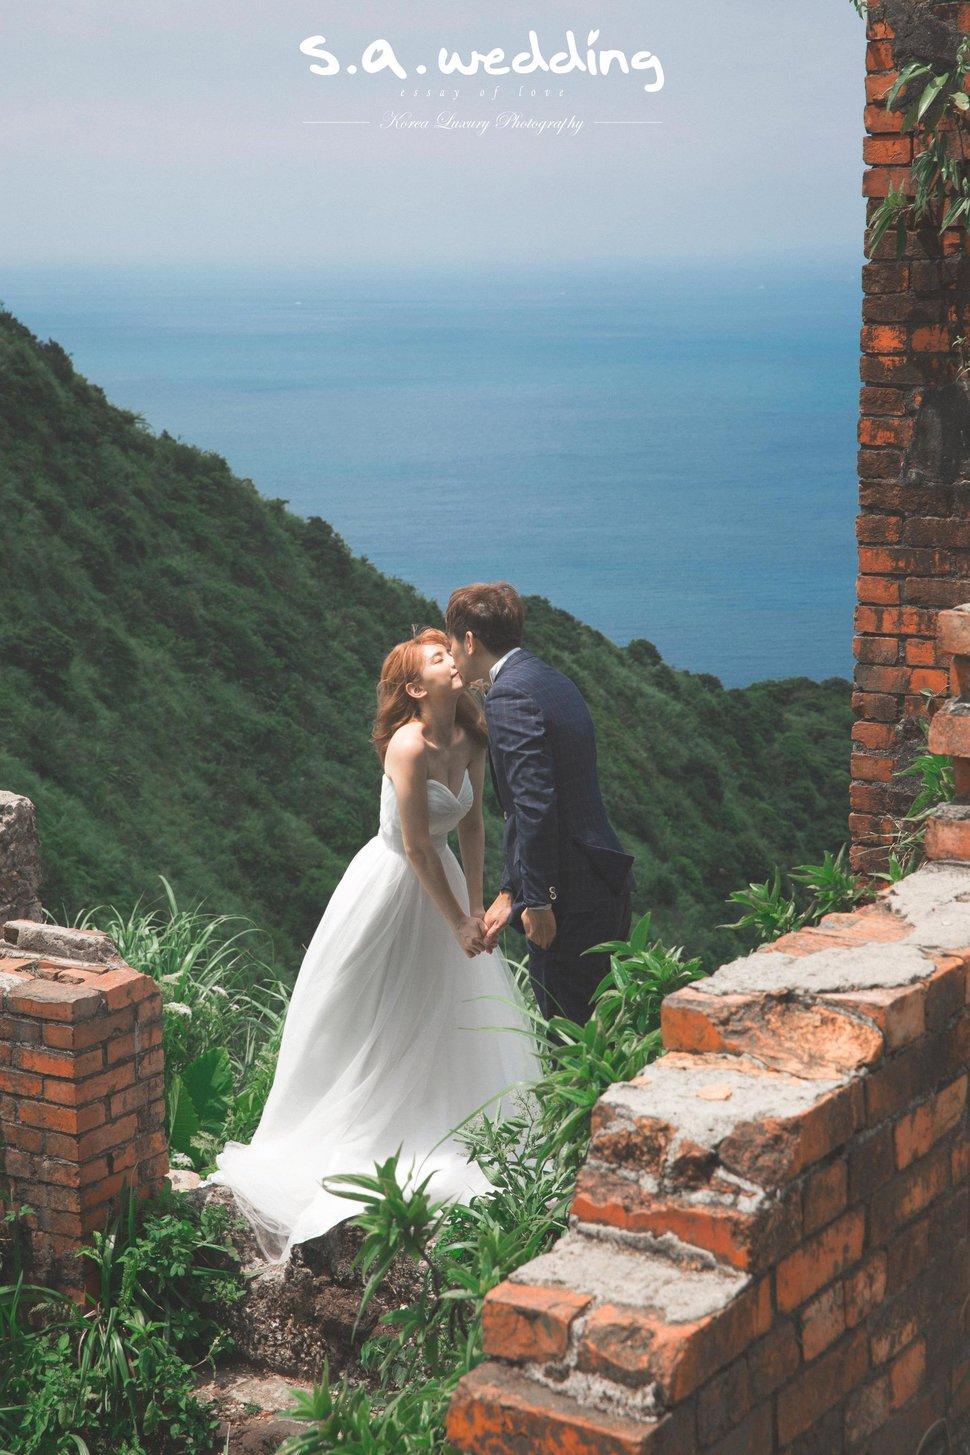 NSH_1235_ps (Copy) - s.a. wedding 韓國婚紗攝影《結婚吧》